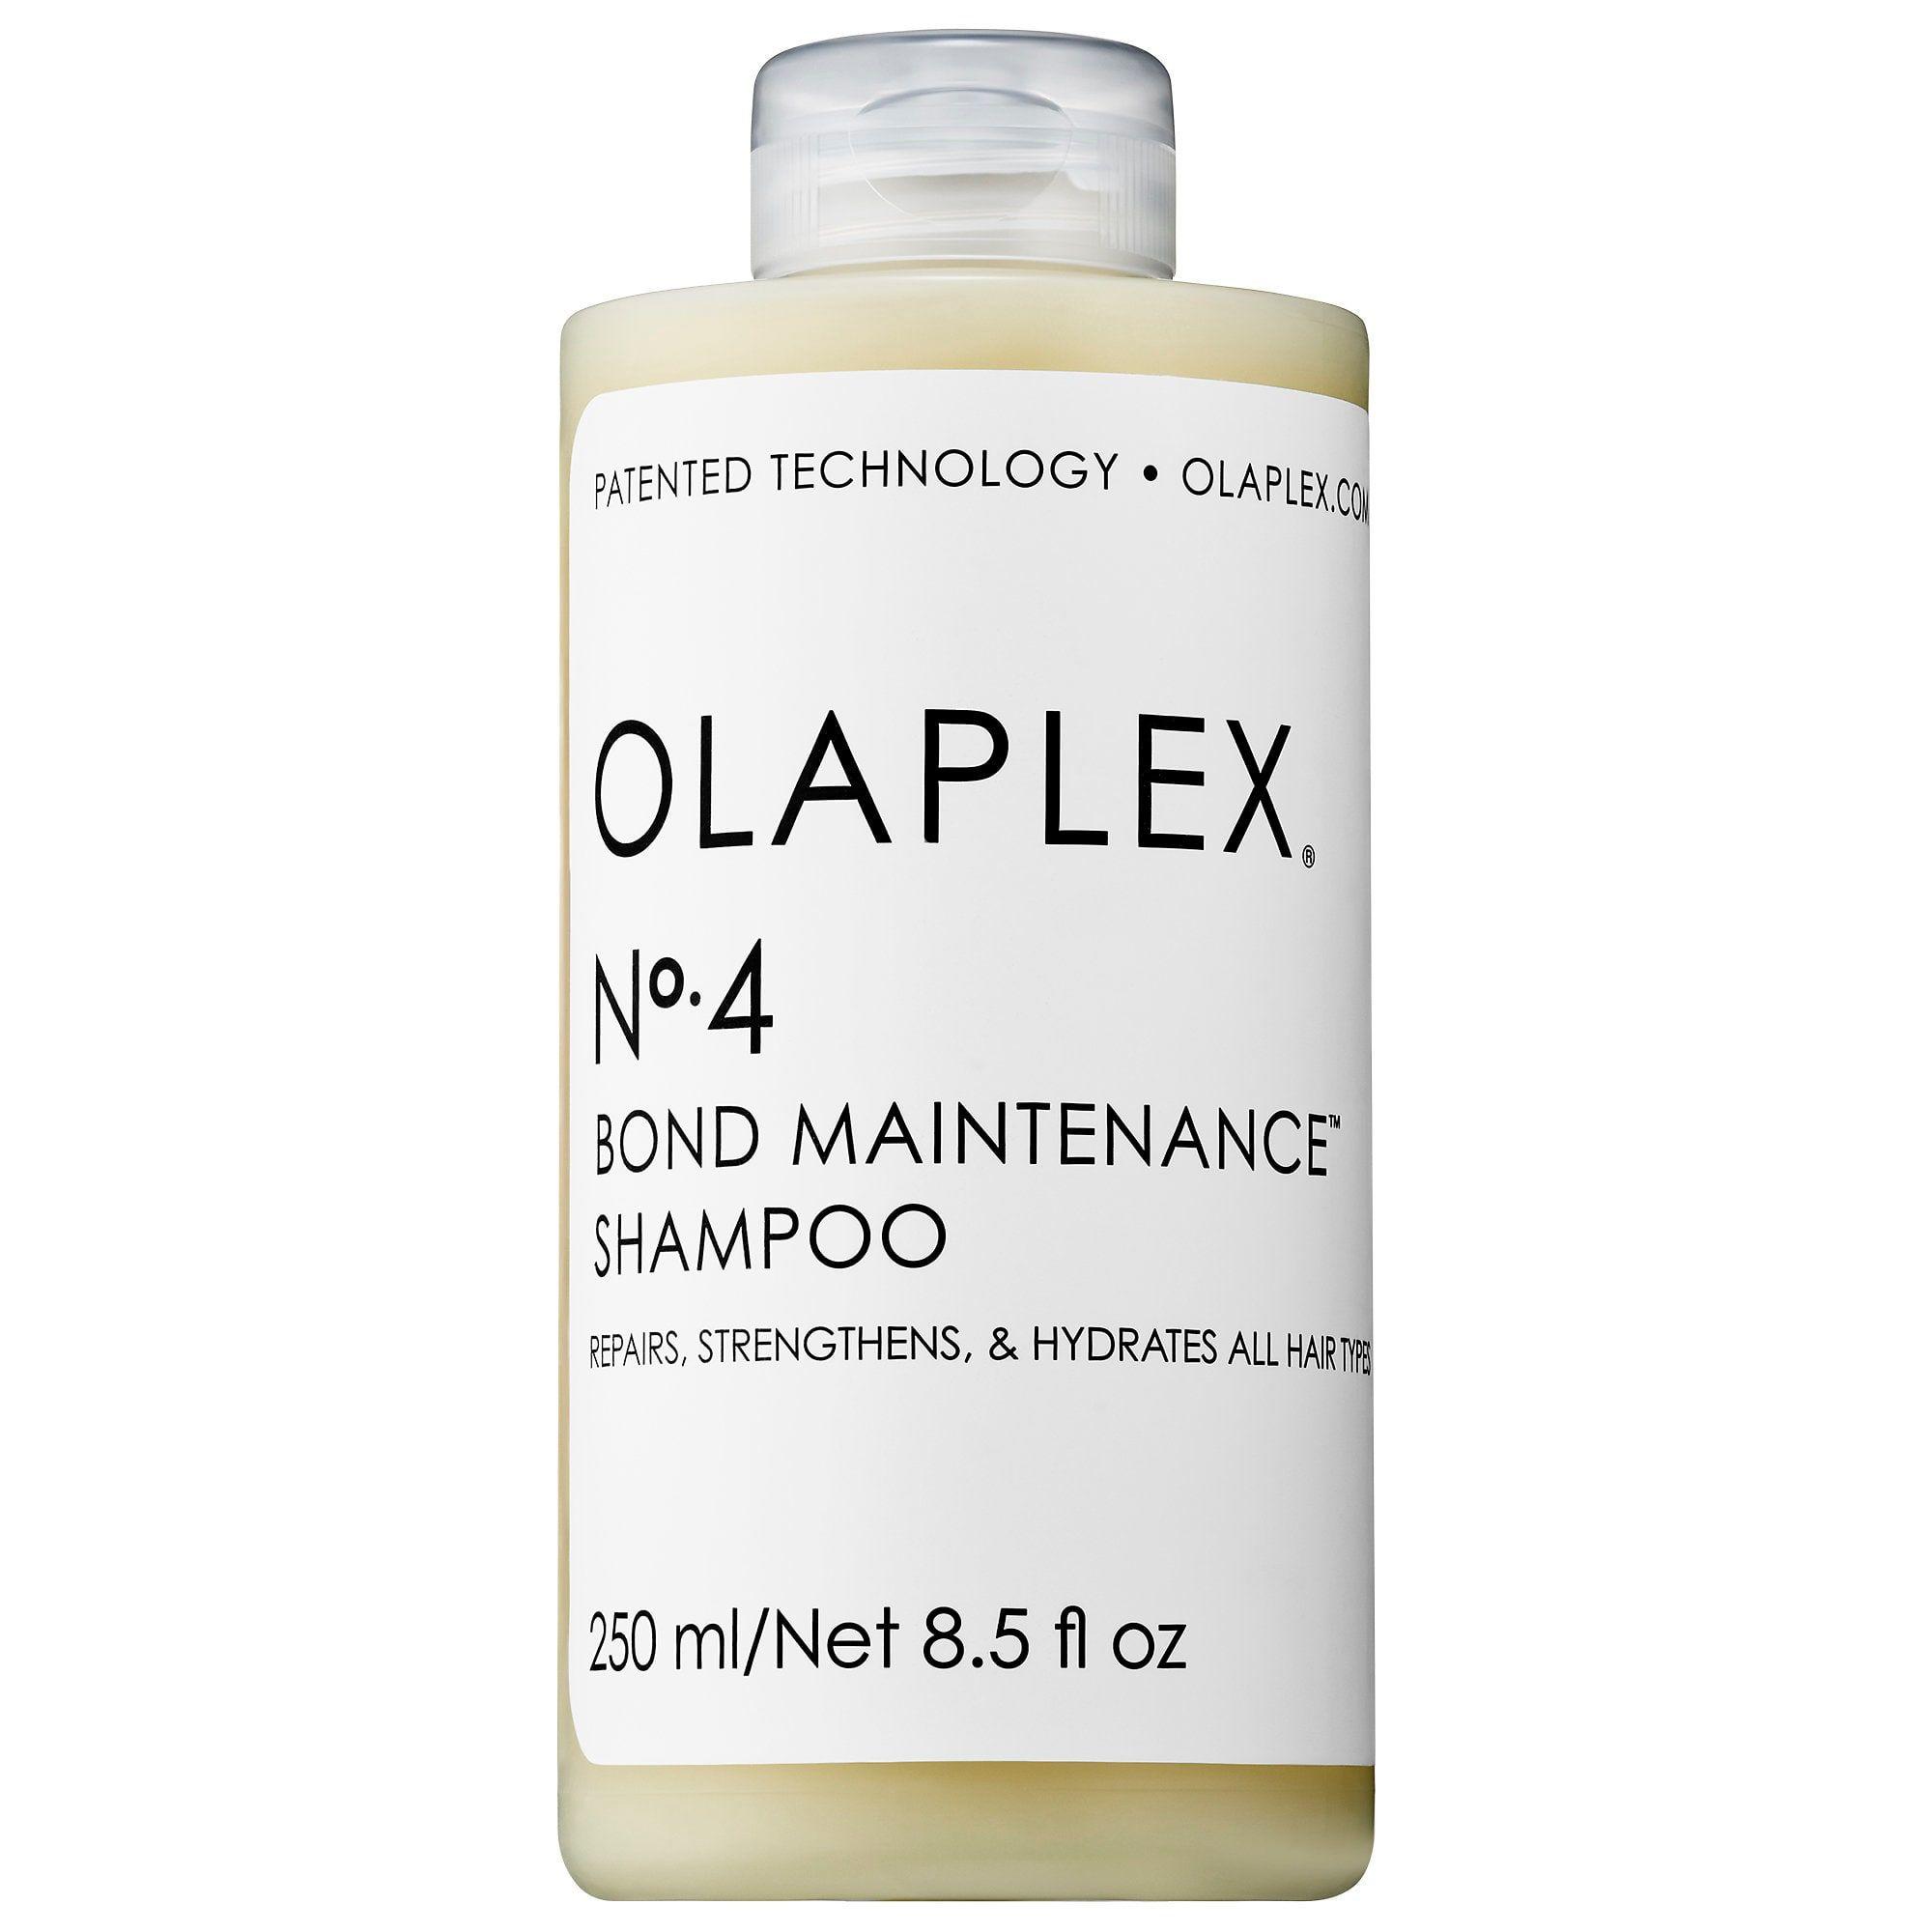 Olaplex No. 4 Bond Maintenance Shampoo Good shampoo